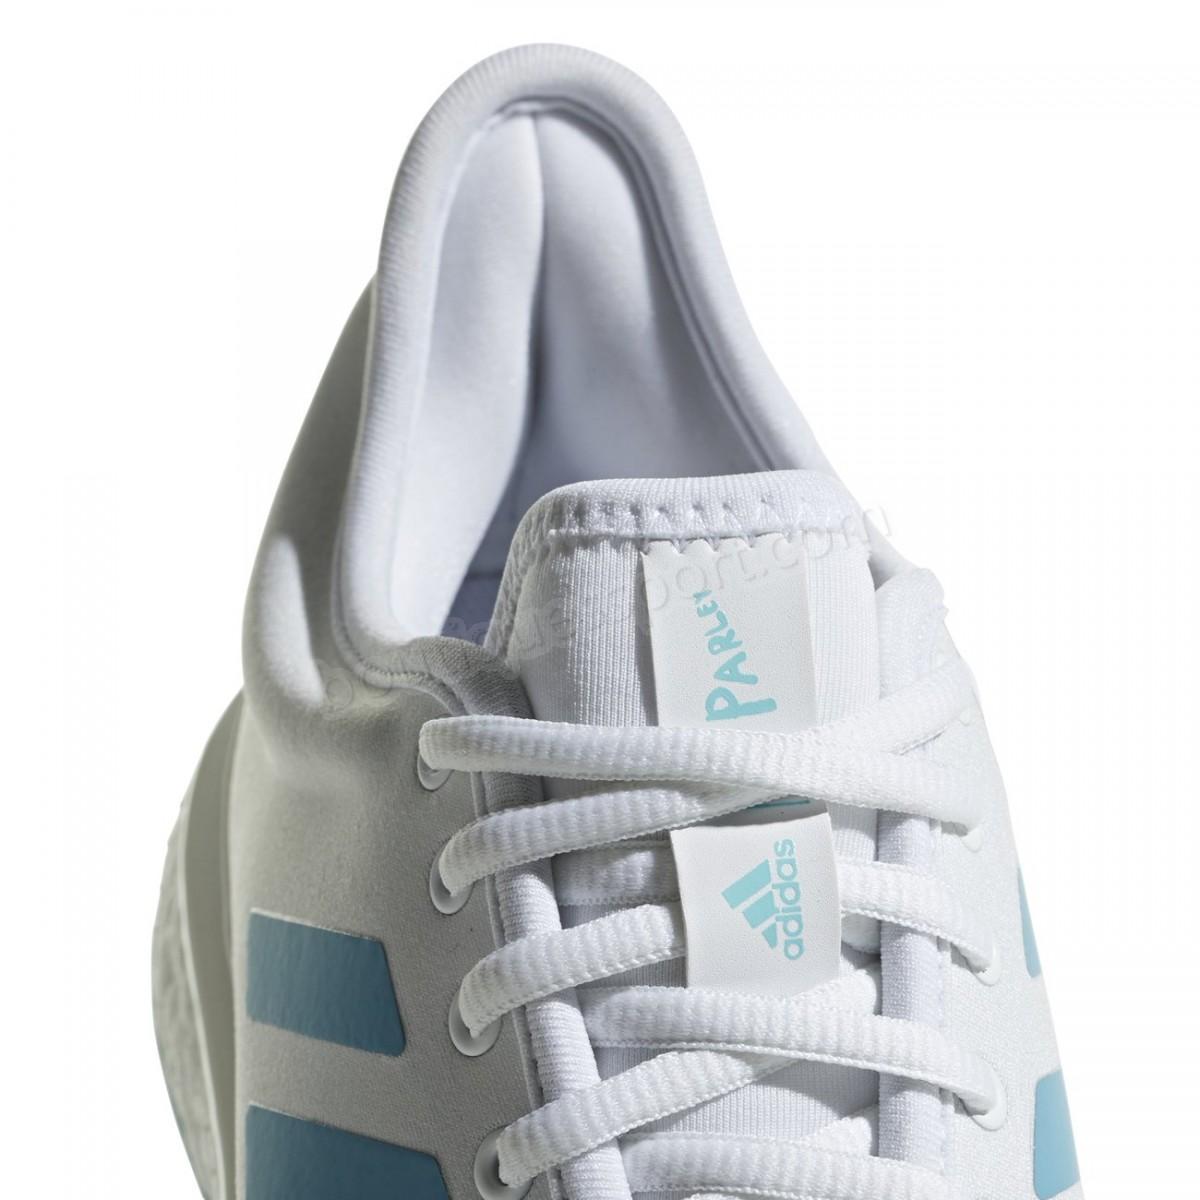 Tennis femme ADIDAS PERFORMANCE Chaussures femme adidas SoleCourt Boost Parley Soldes - -5